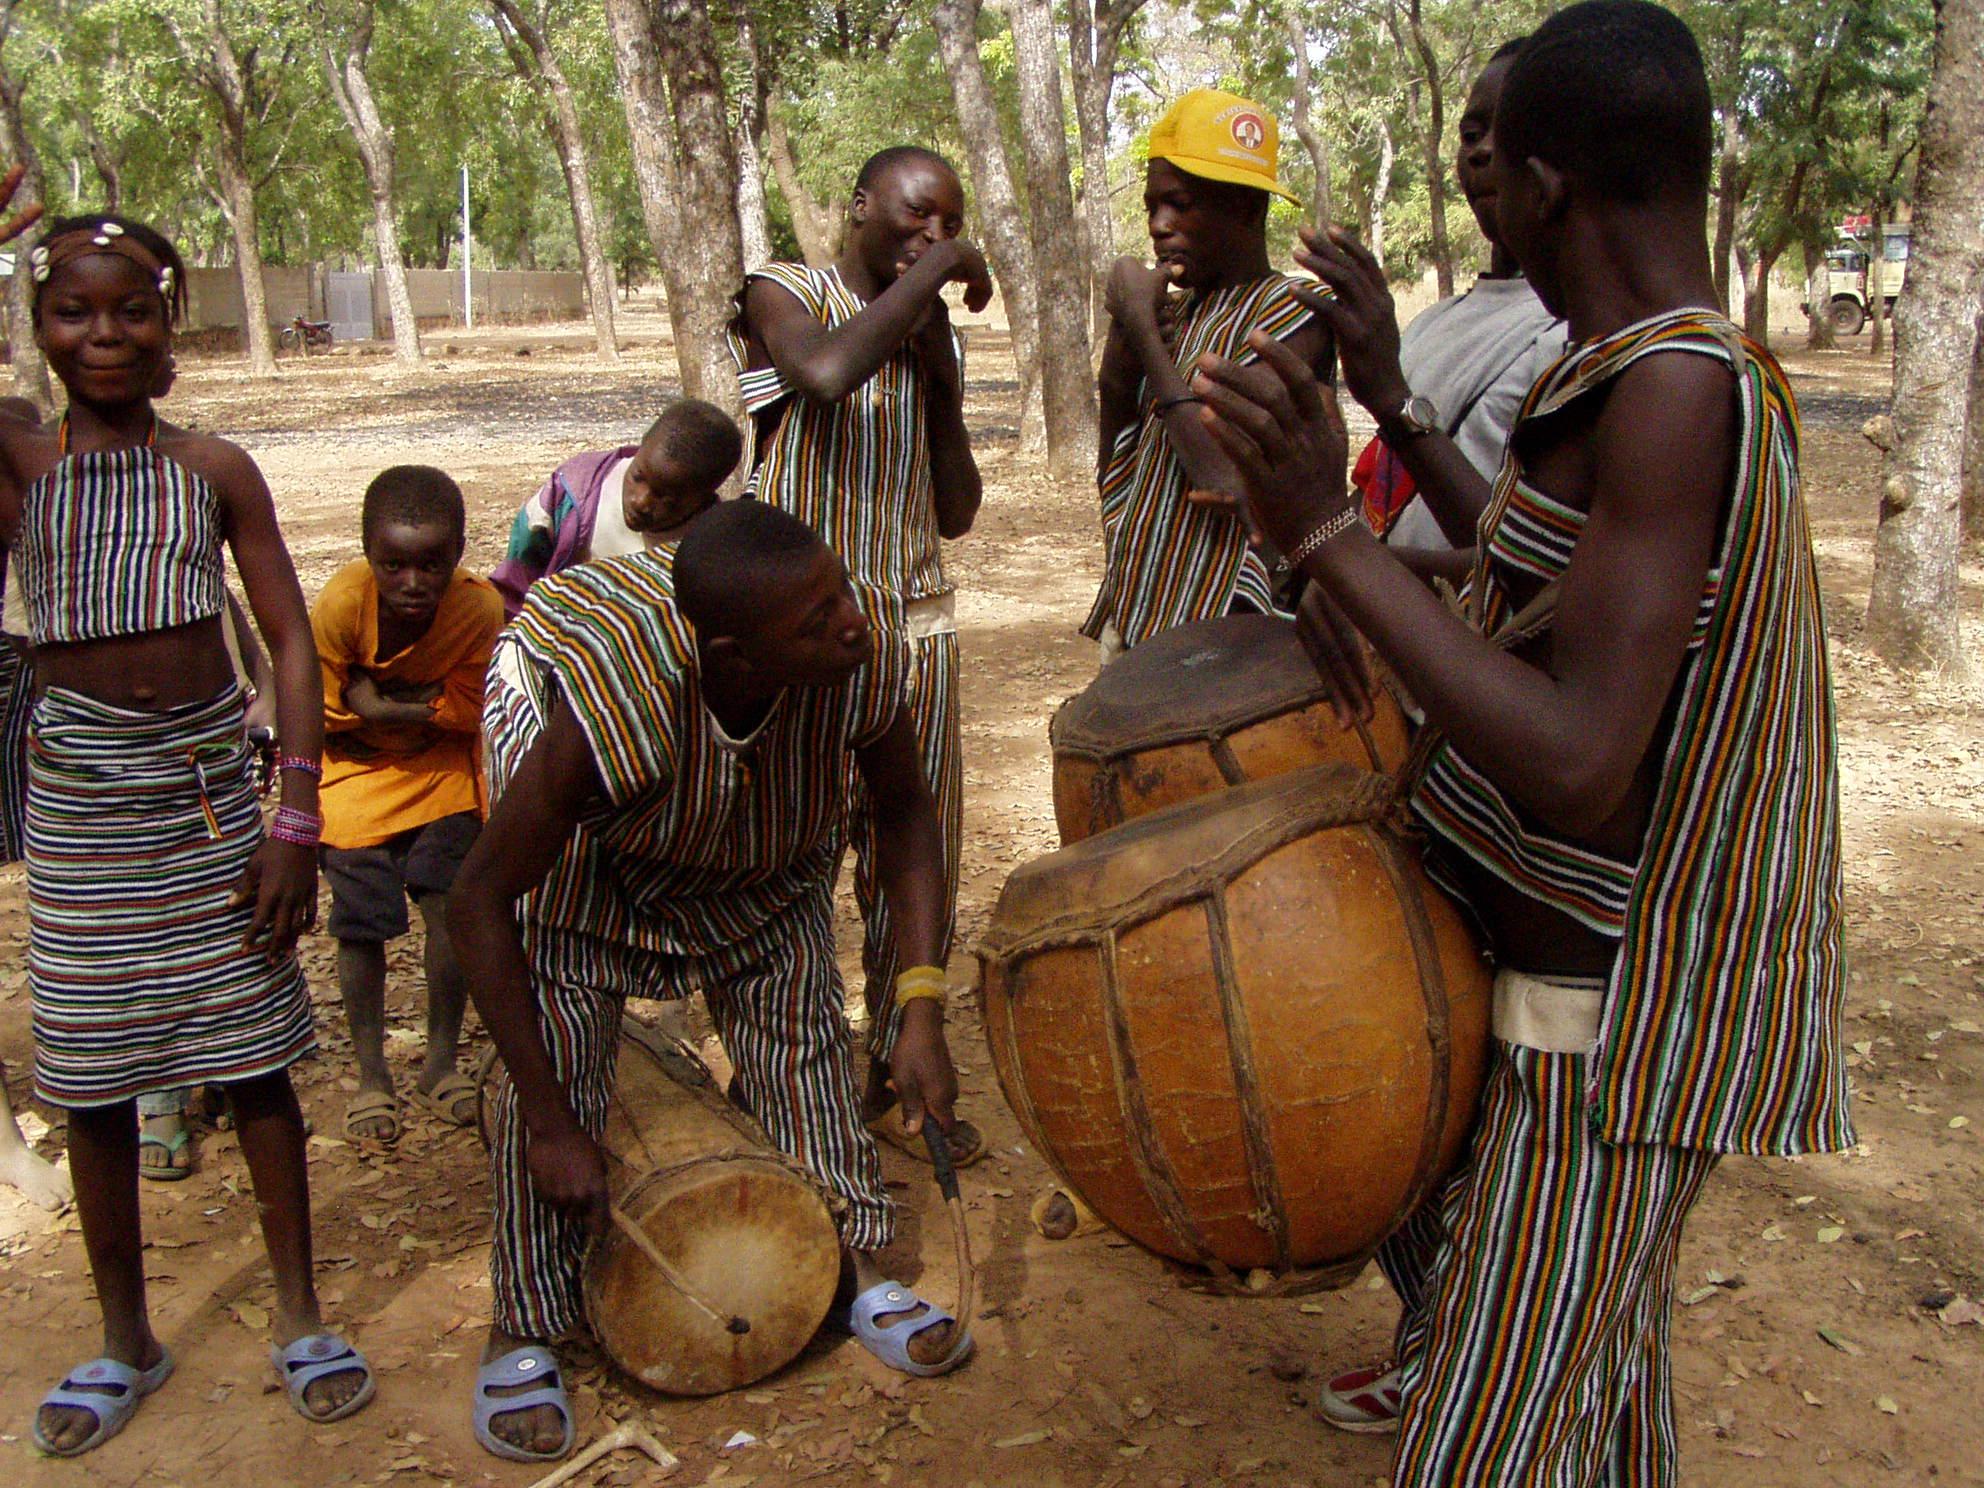 Musiciens kassena en action. Kassena musicians in action.